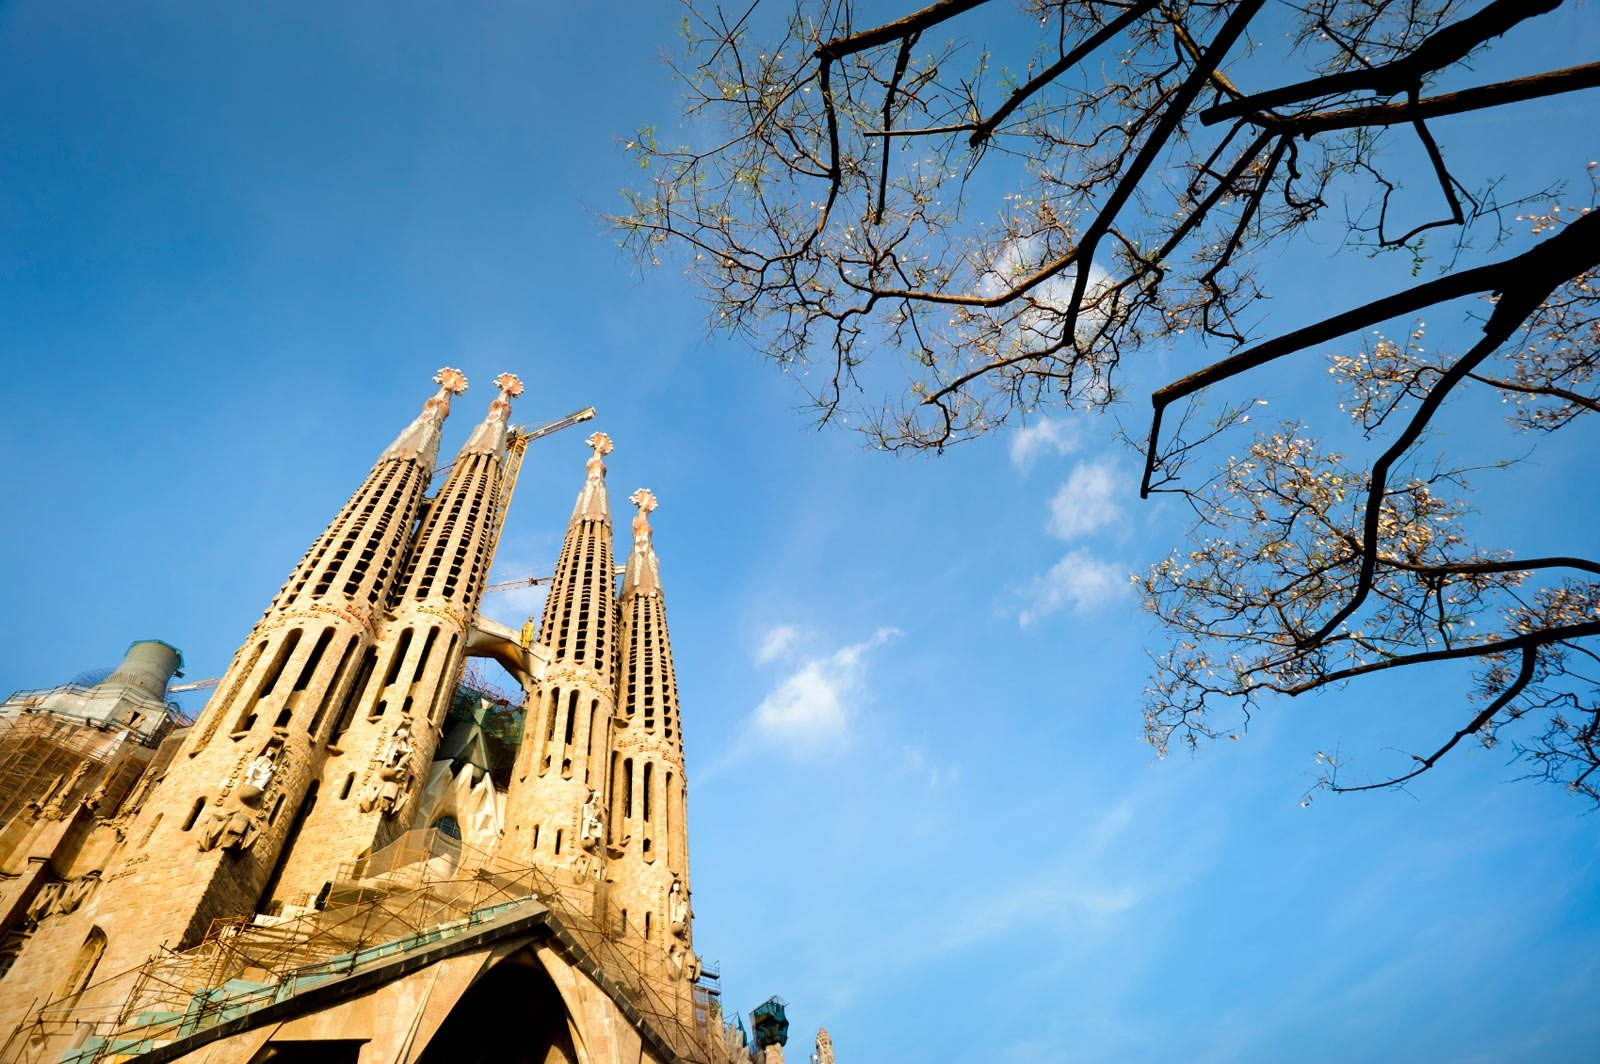 Hotel Icaria Barcelona modernismo